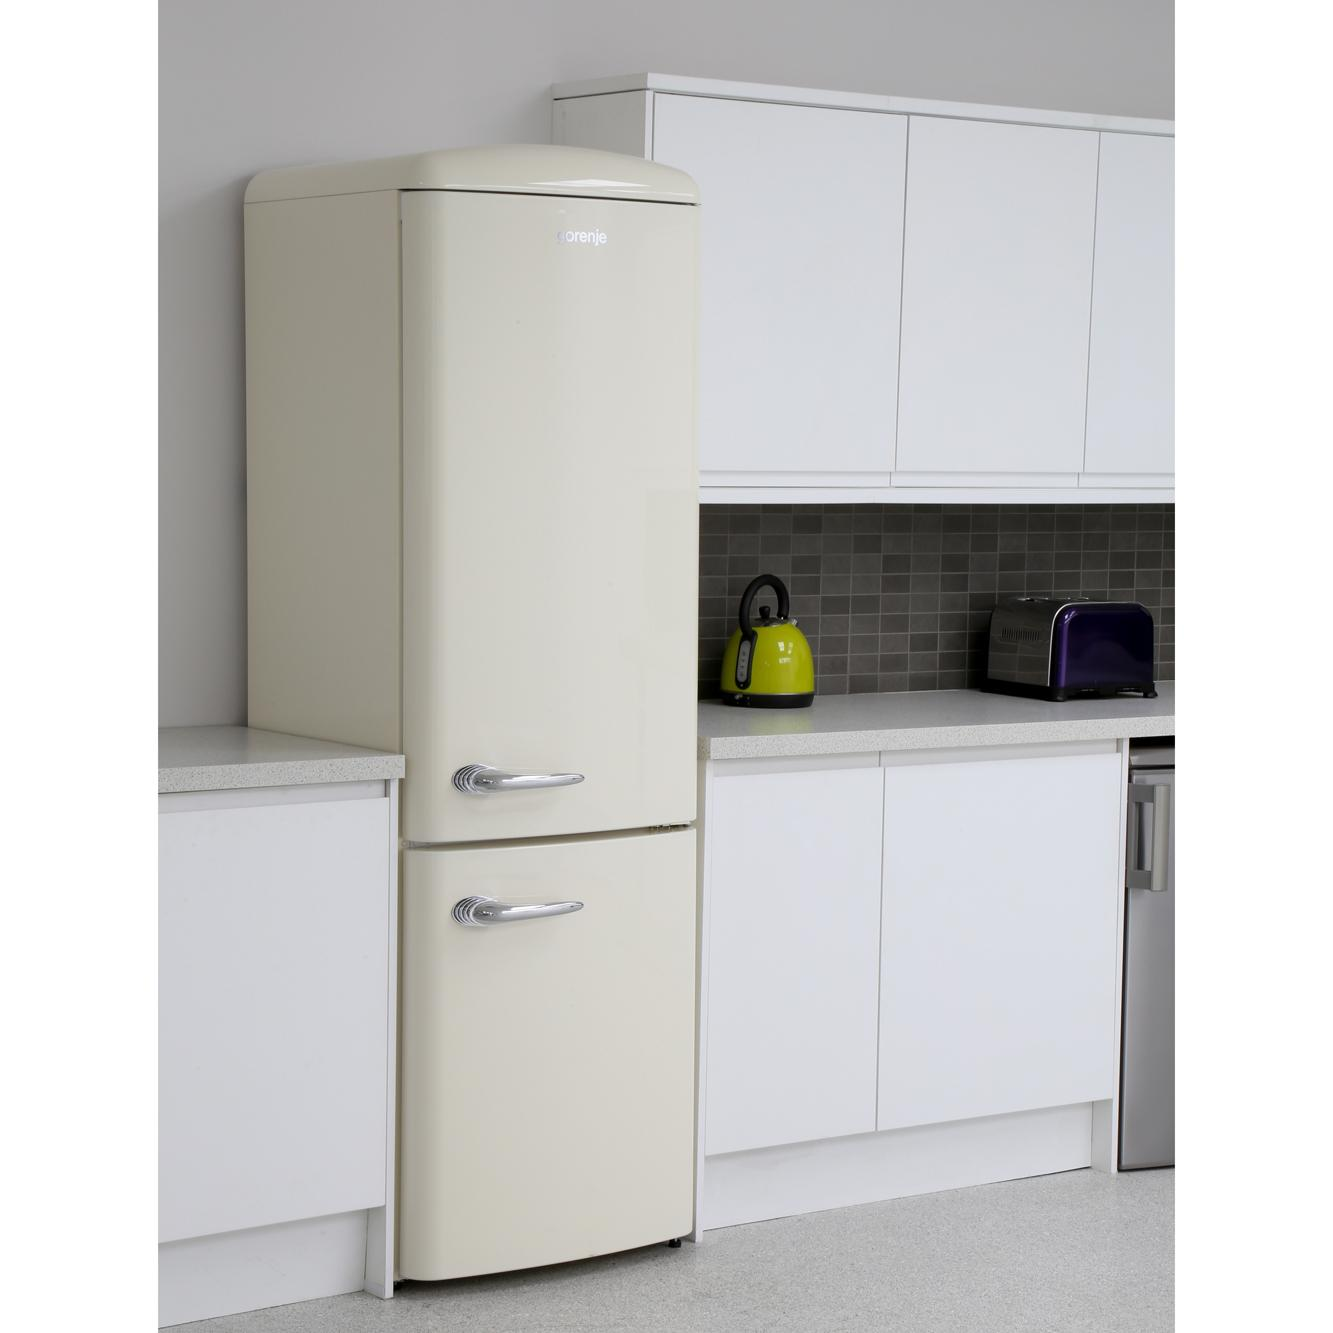 buy gorenje onrk193c retro frost free fridge freezer cream marks electrical. Black Bedroom Furniture Sets. Home Design Ideas